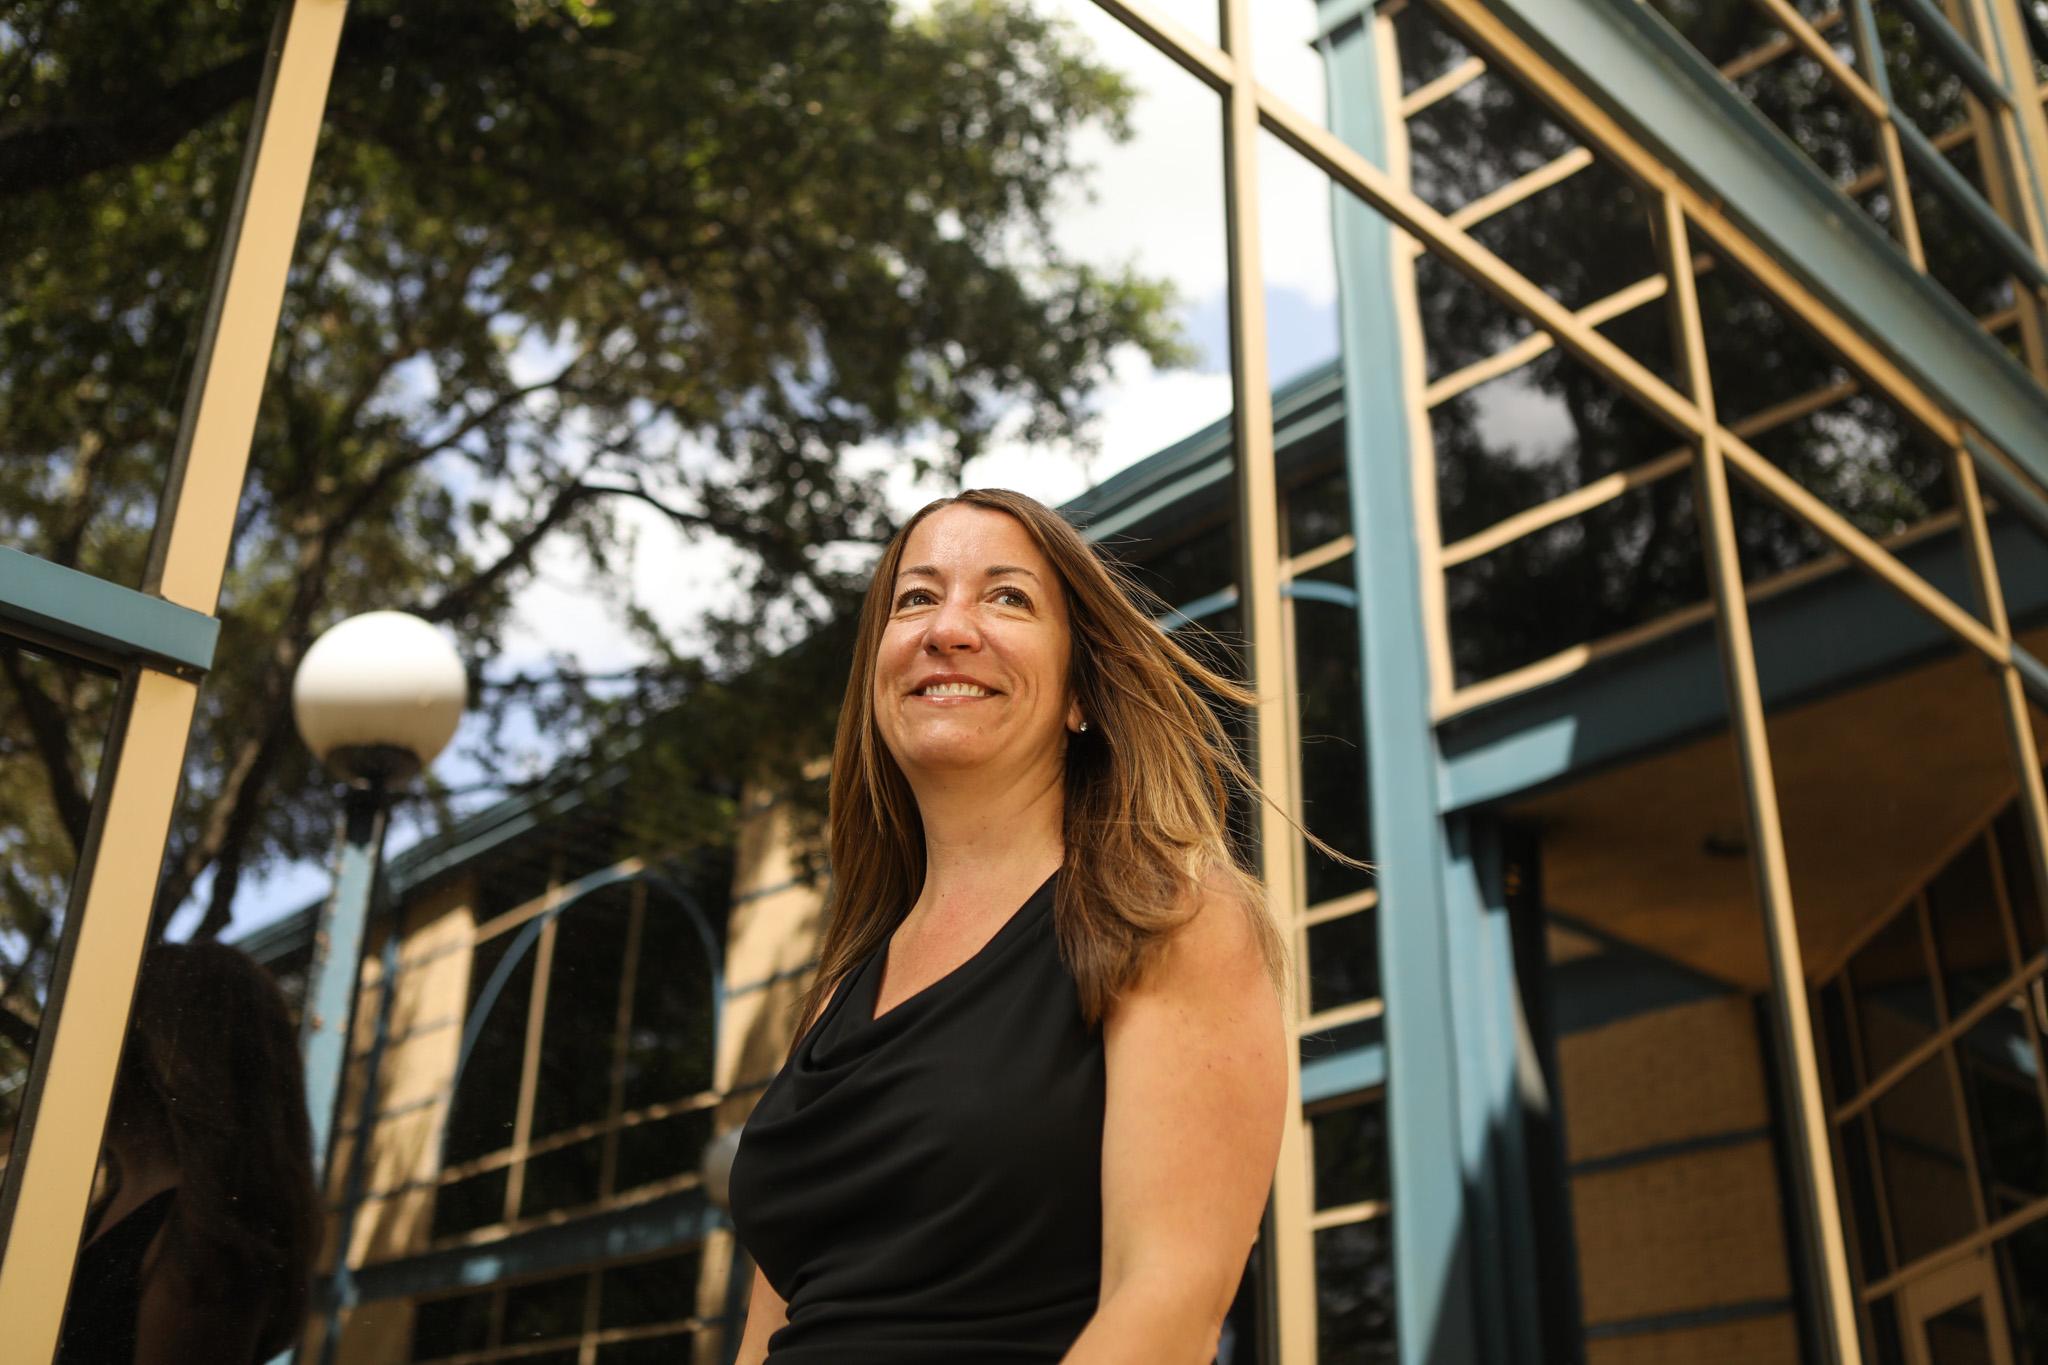 San Antonio Police Department Psychologist Melissa Graham.